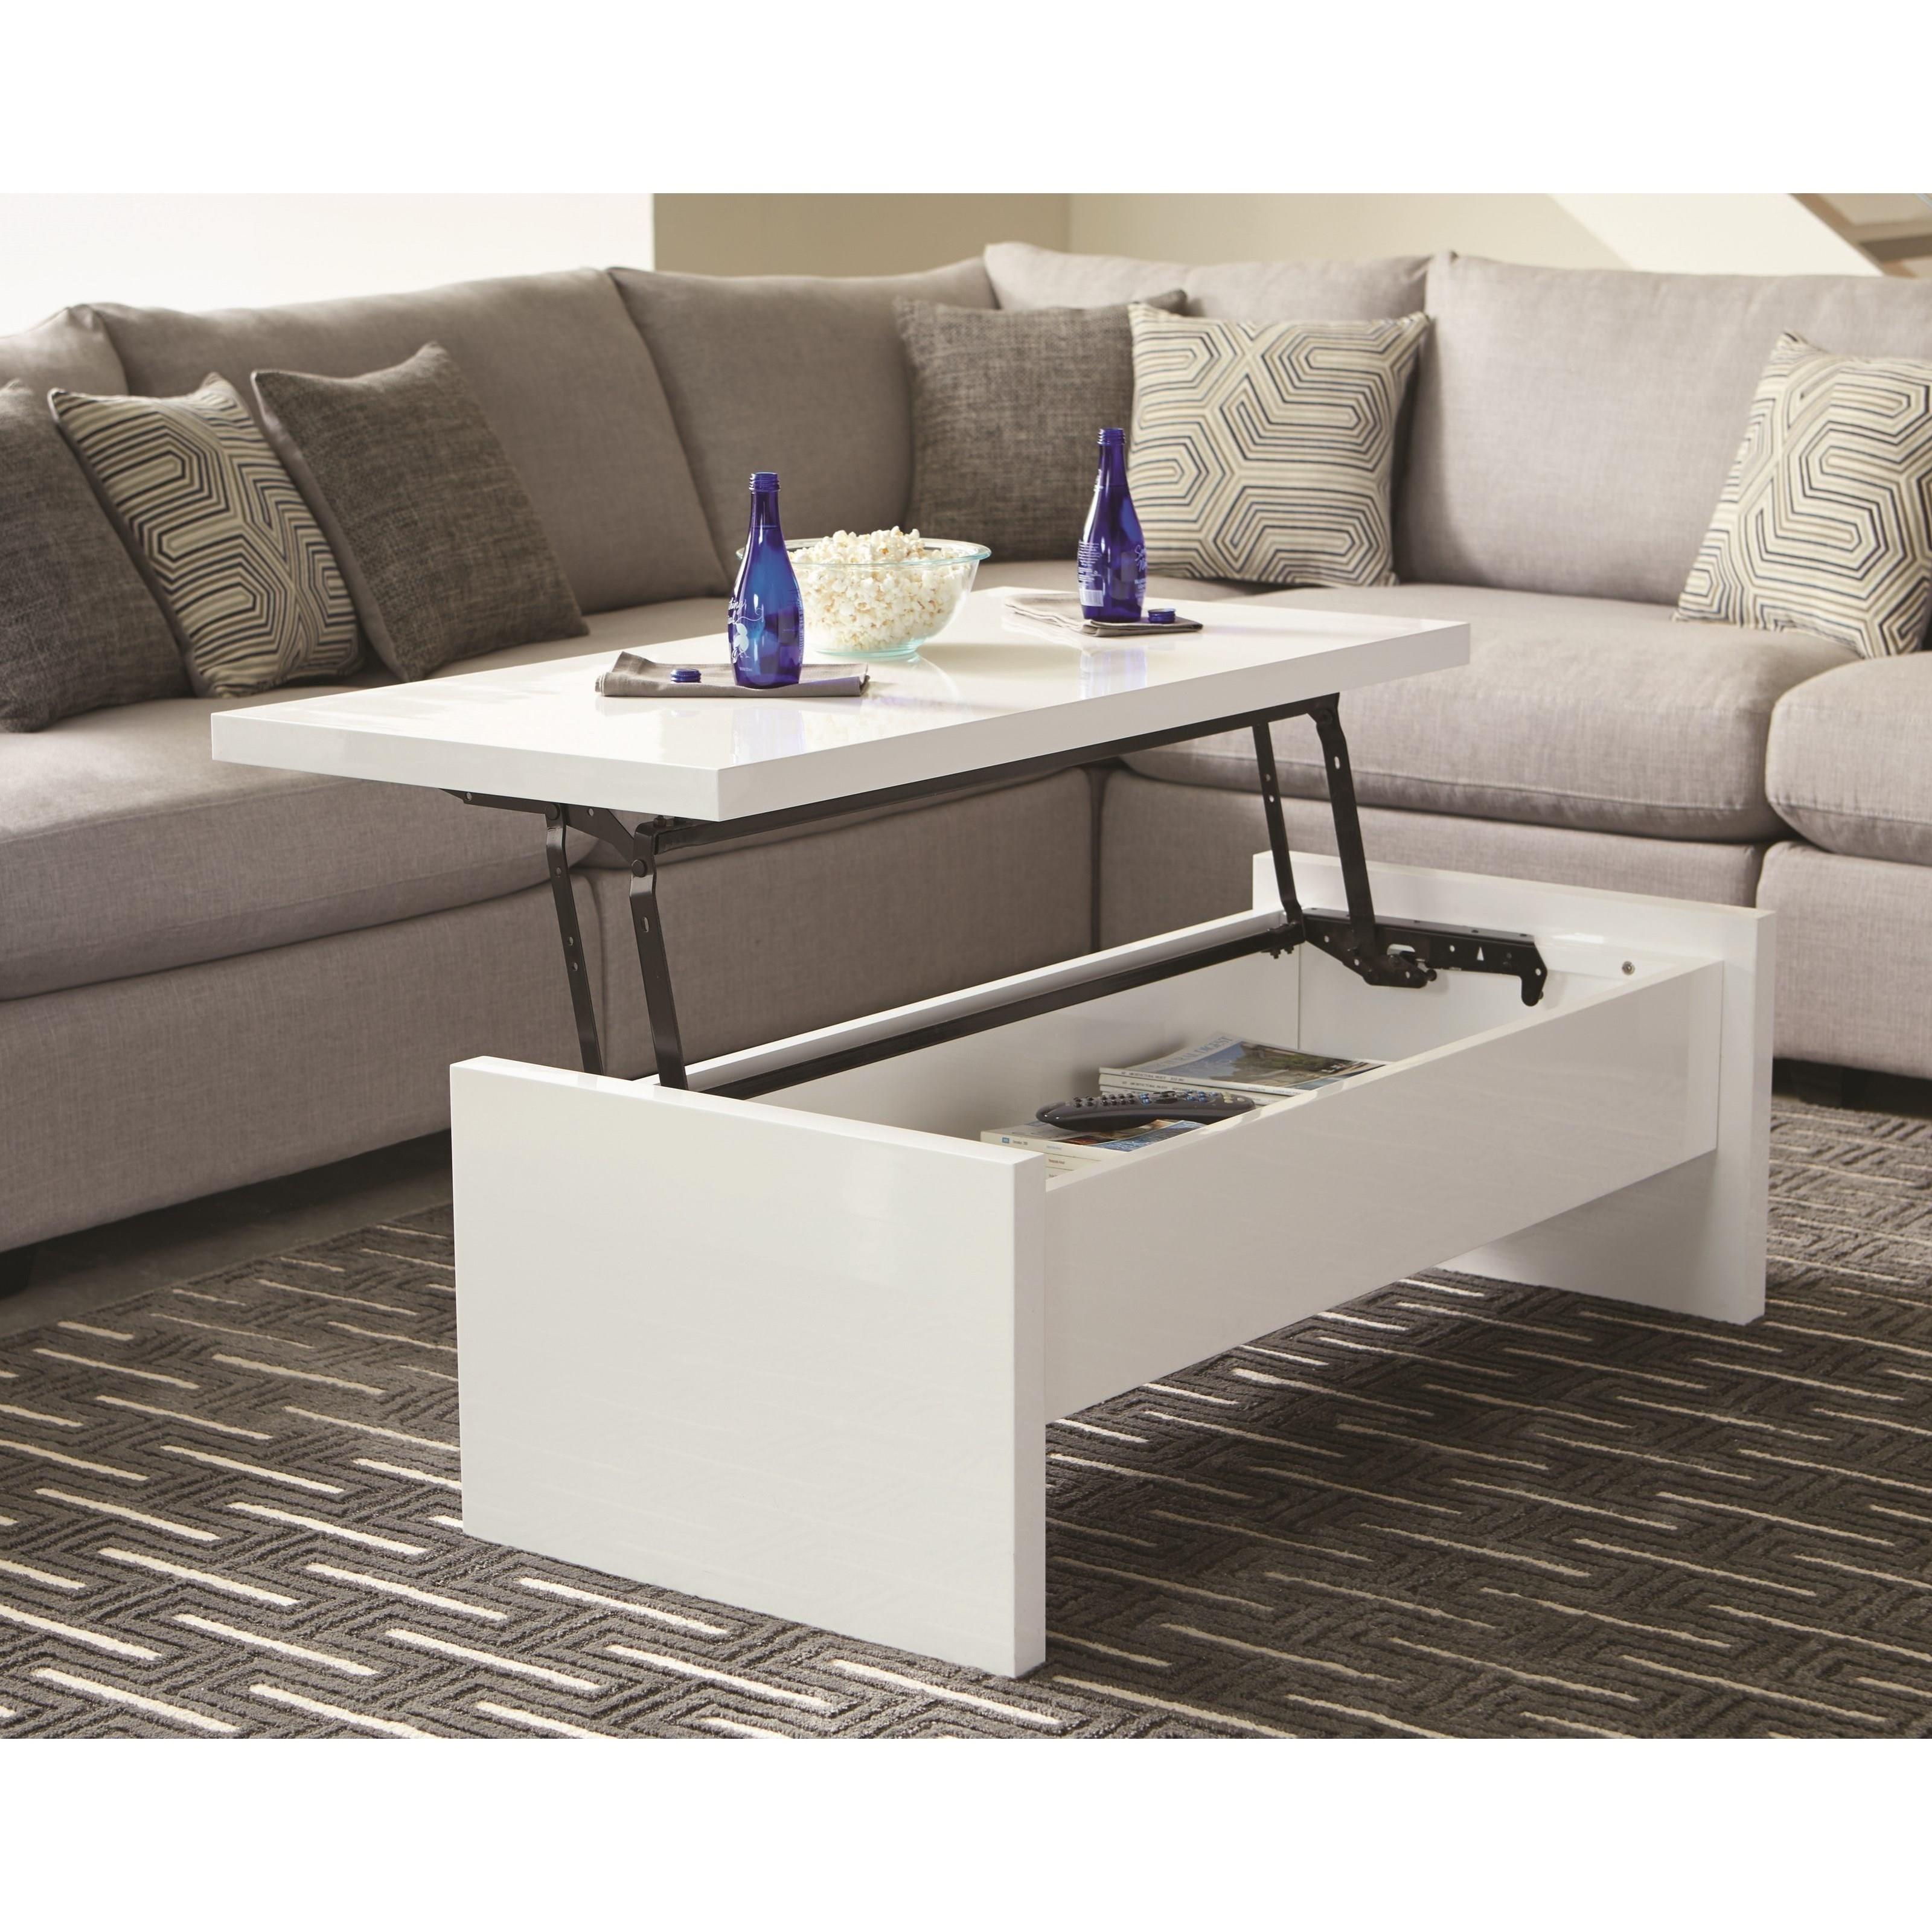 Scott Living Modern Coffee Table - Item Number: 721248